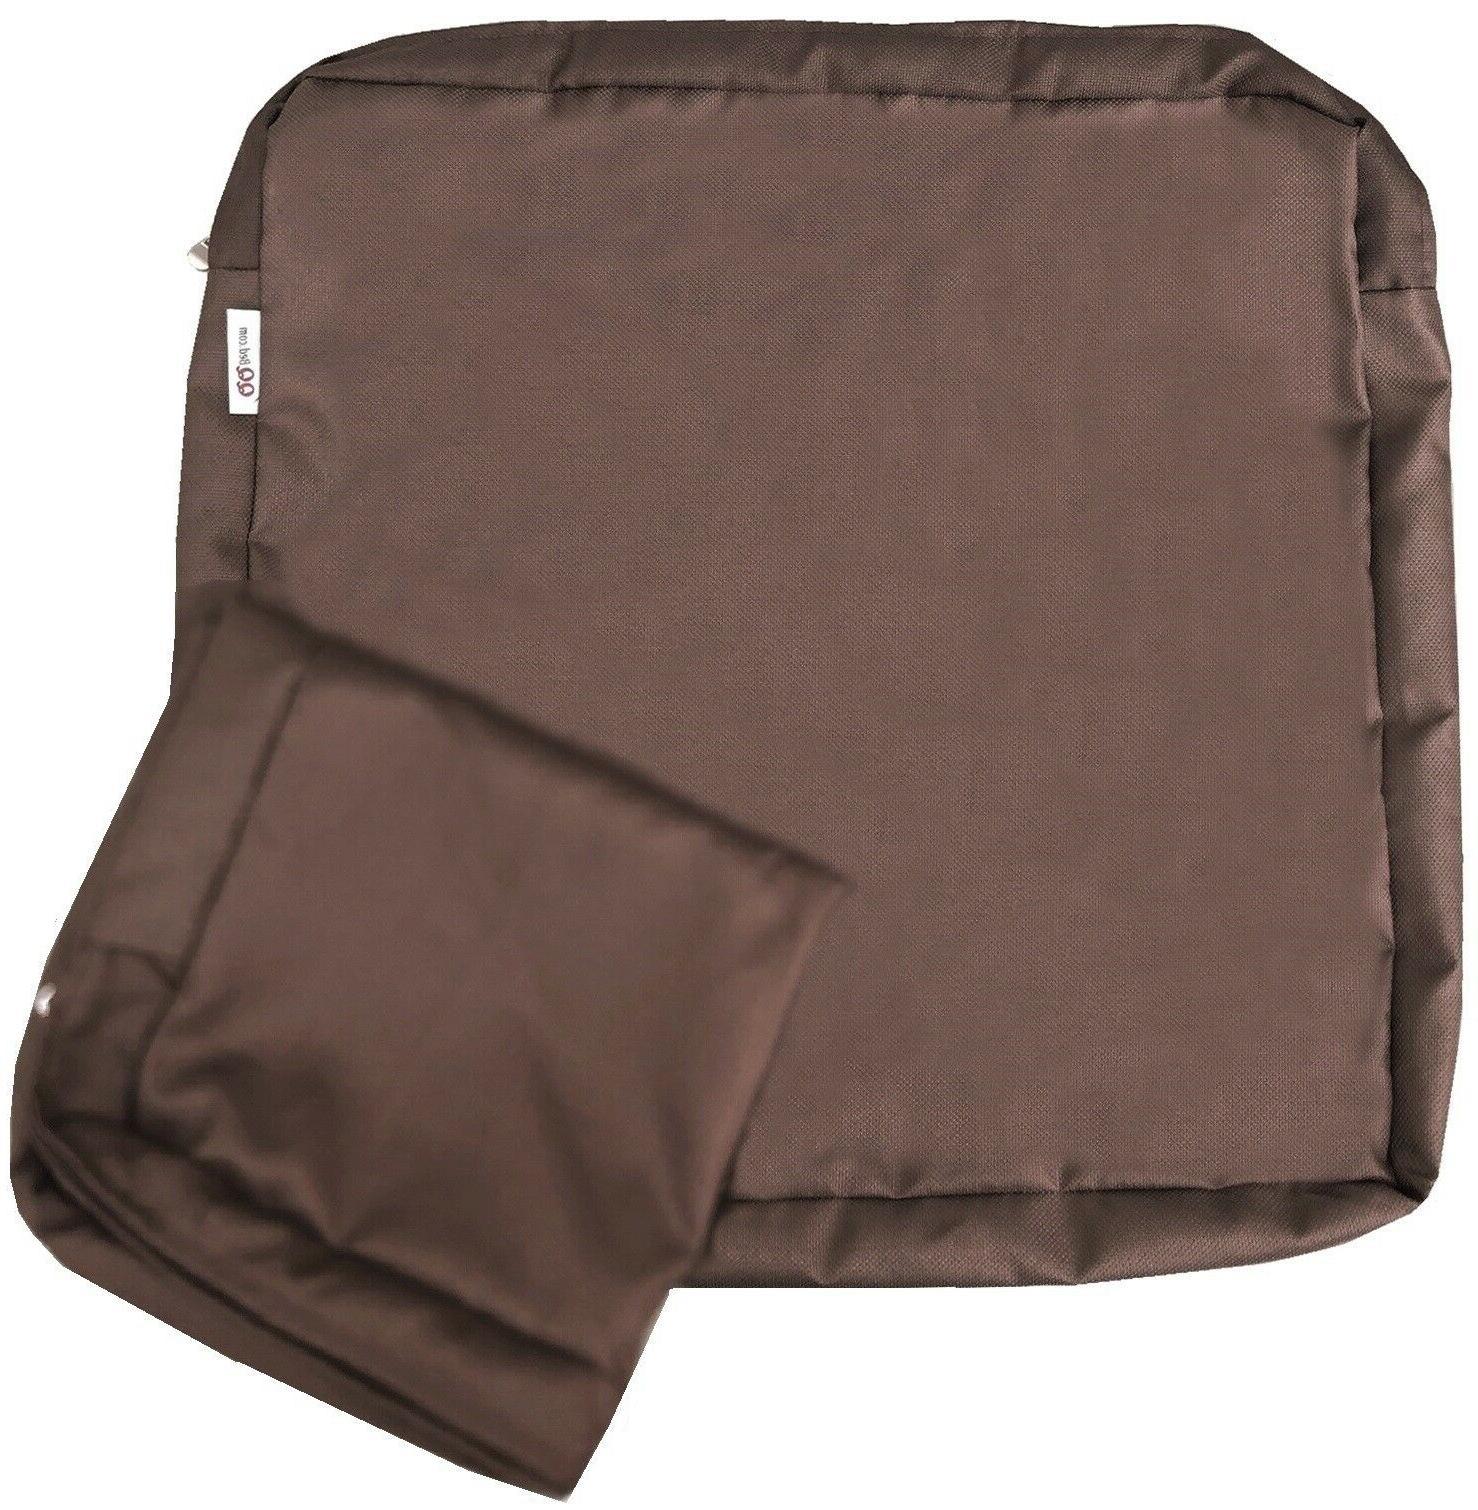 "Outdoor Pack Seat Chair Cushions Zipper 18""X16""X4"" M"